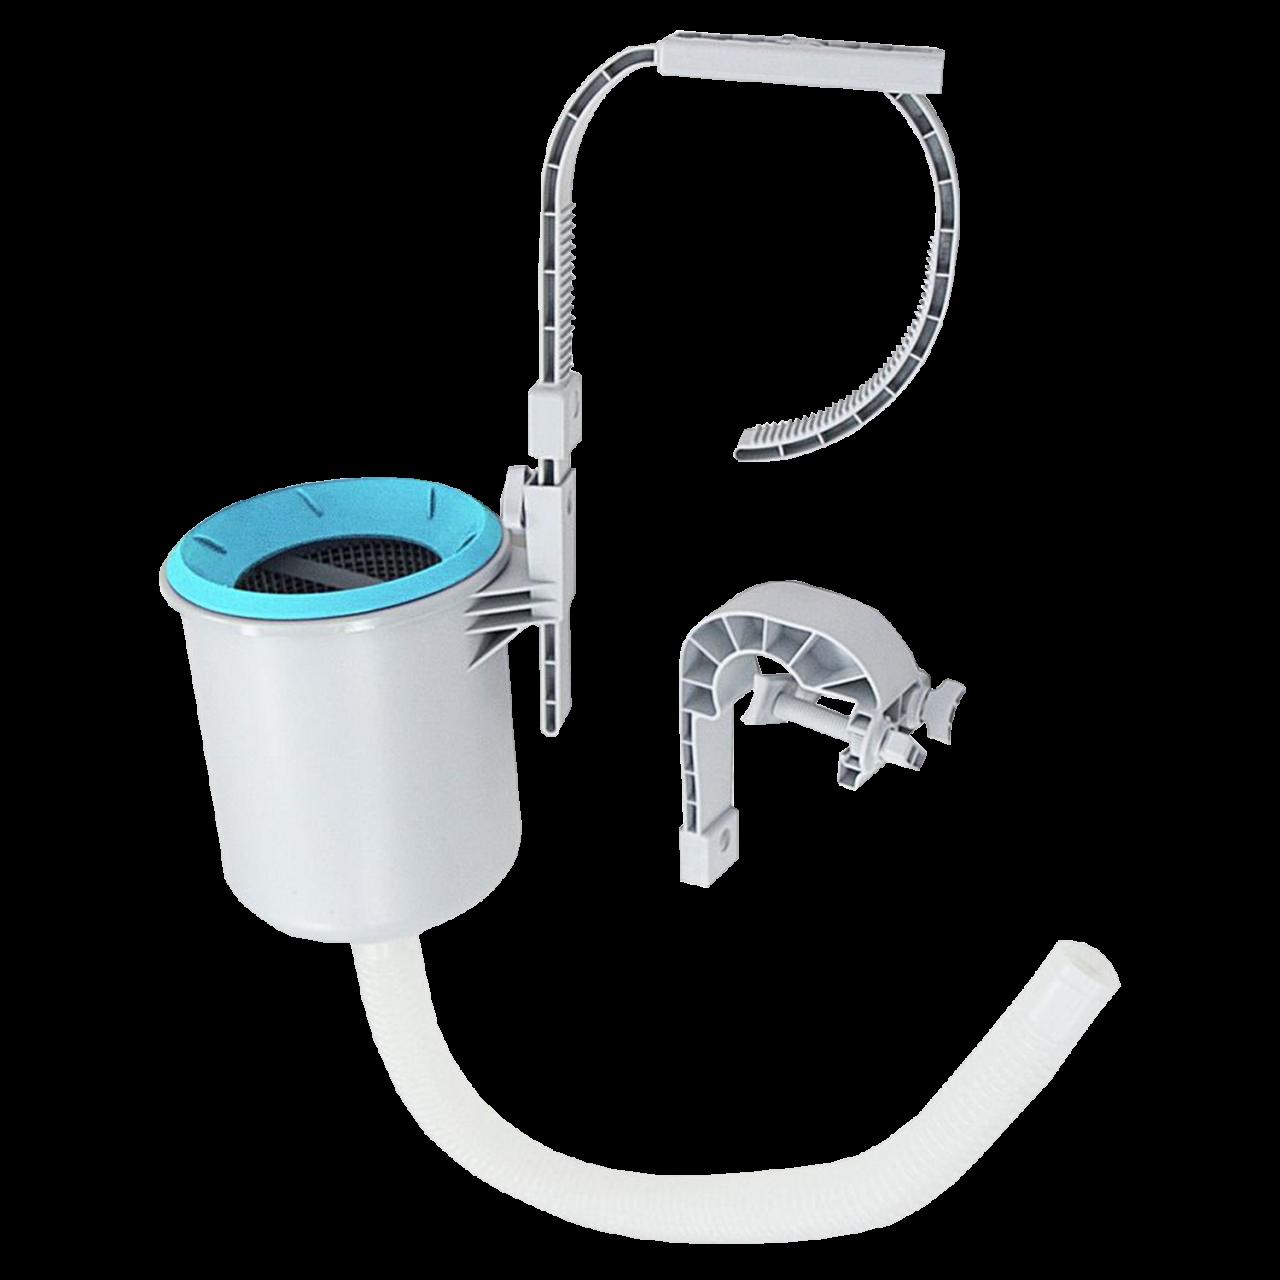 Intex Oberflächenskimmer Skimmer Deluxe Poolreiniger Pool Filter Sauger 28000